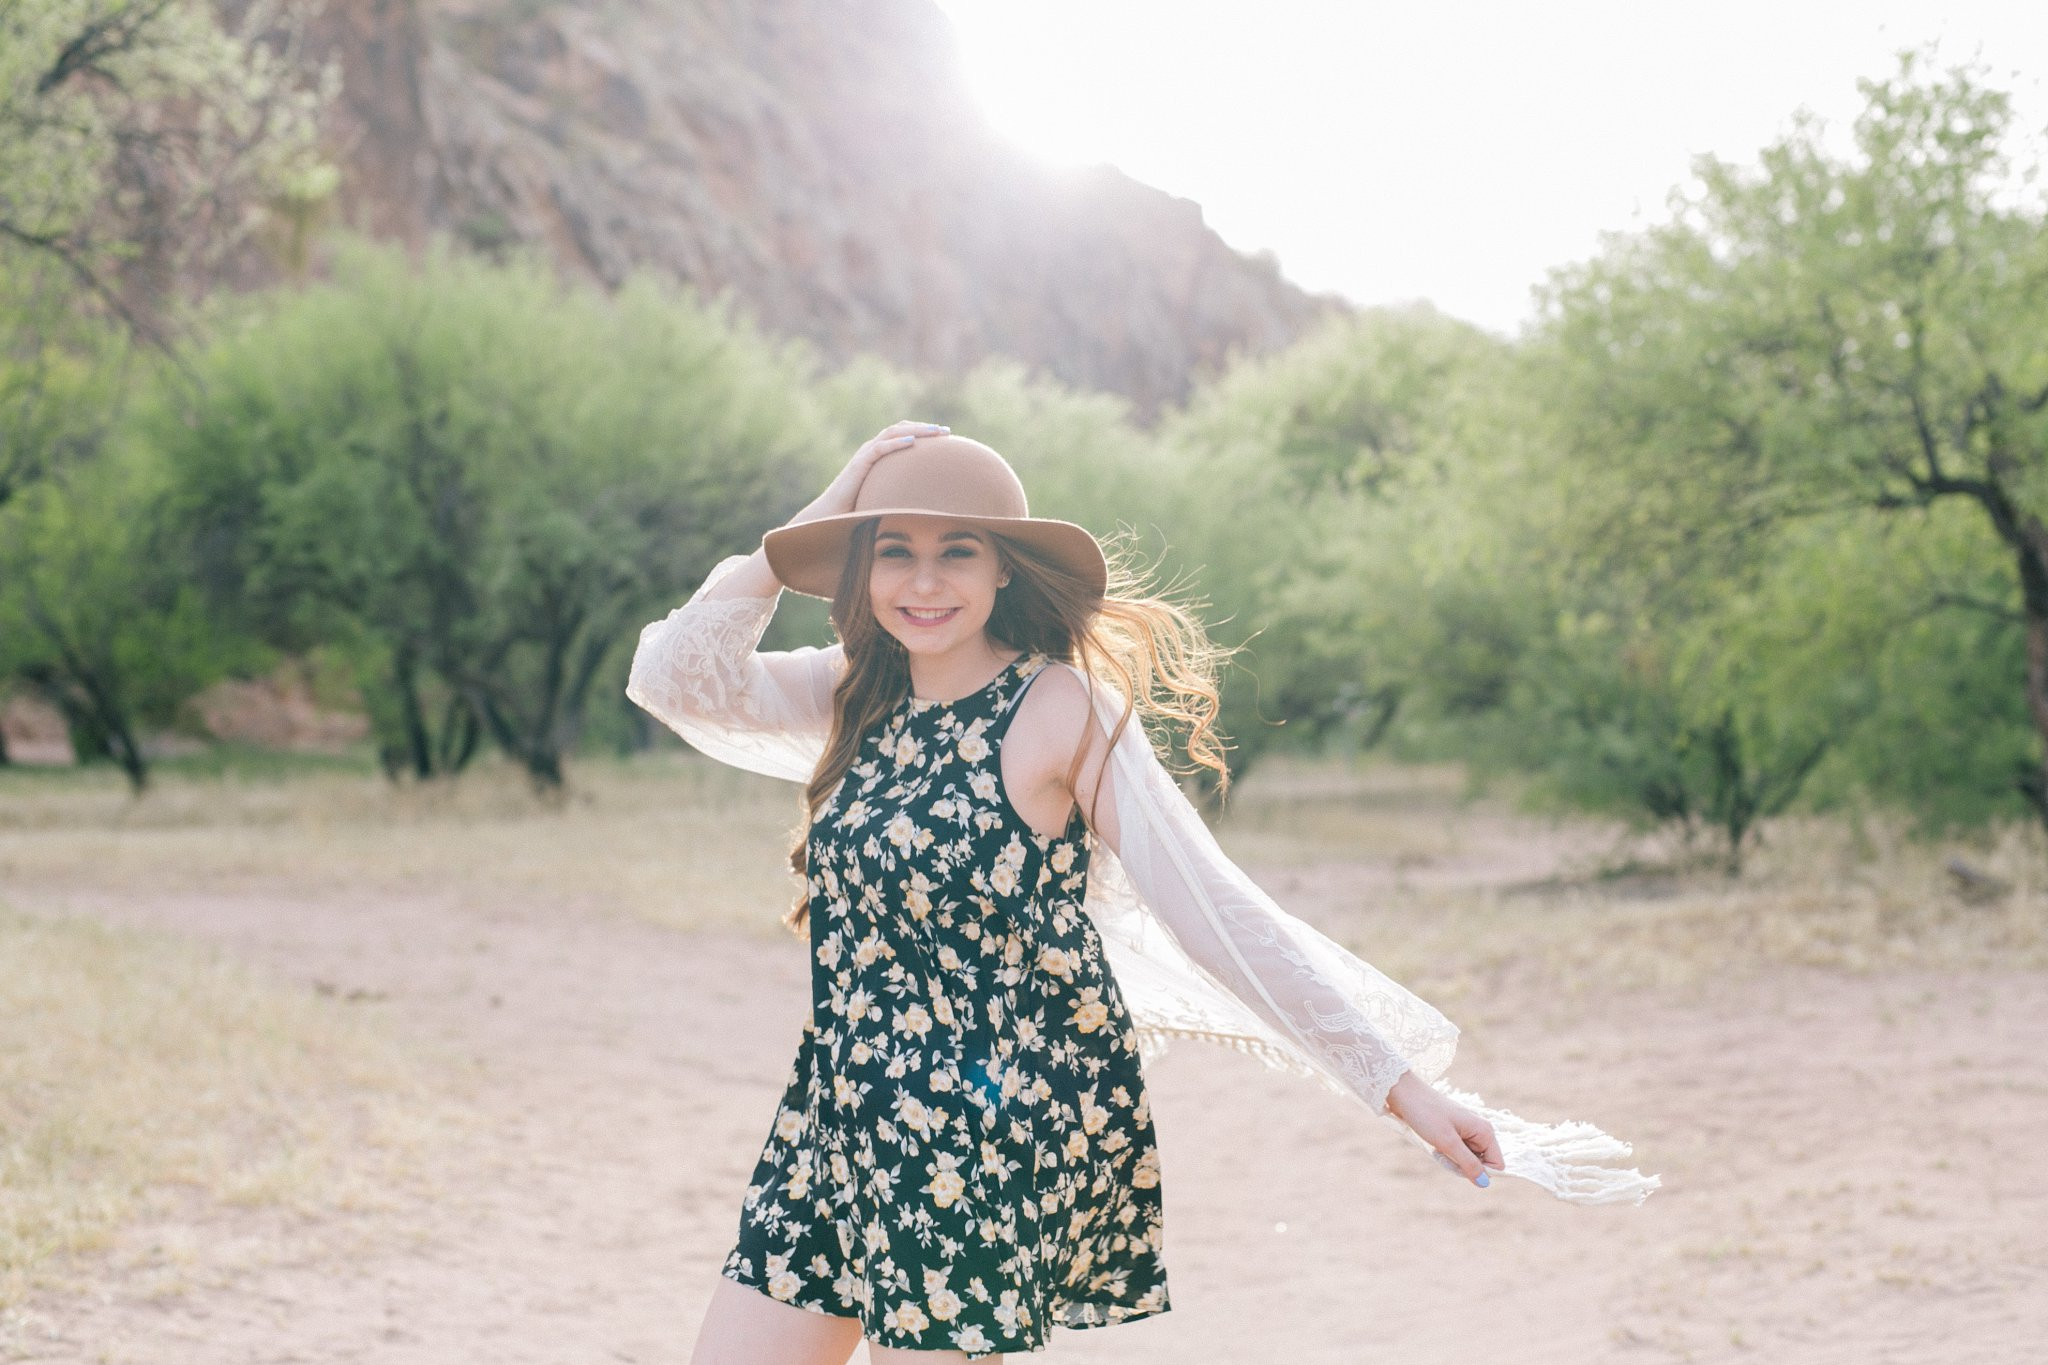 outdoor nature senior photos in Arizona